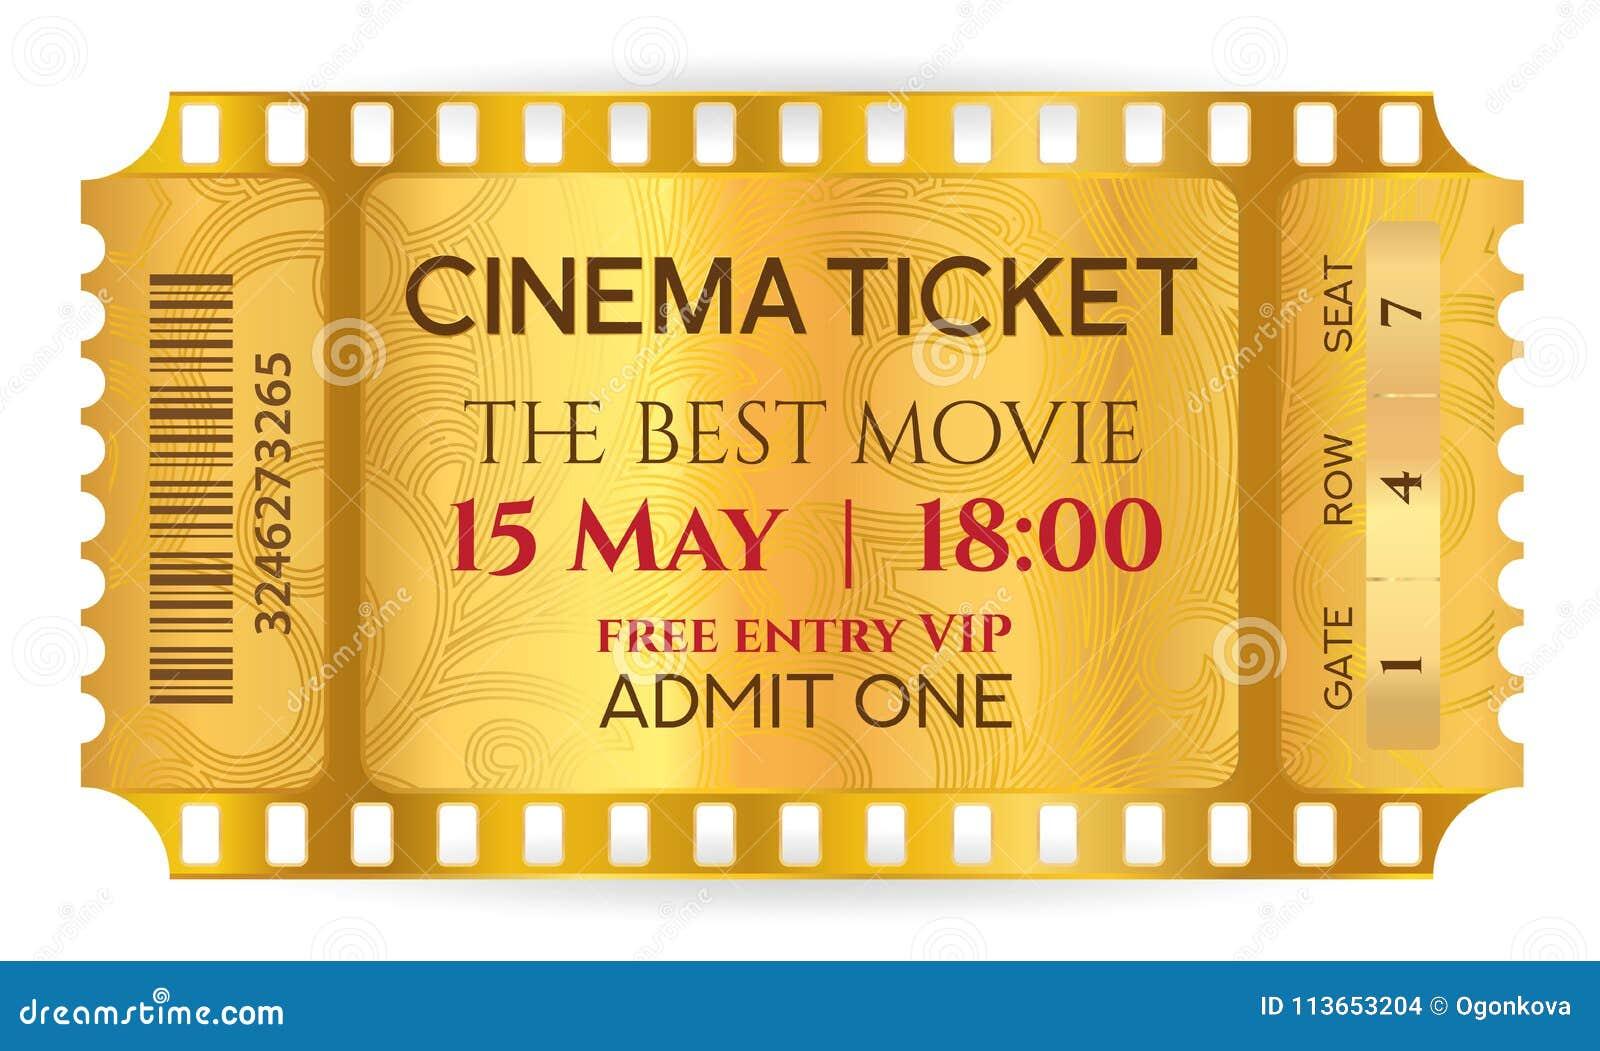 cinema ticket golden ticket token template tear off ticket film